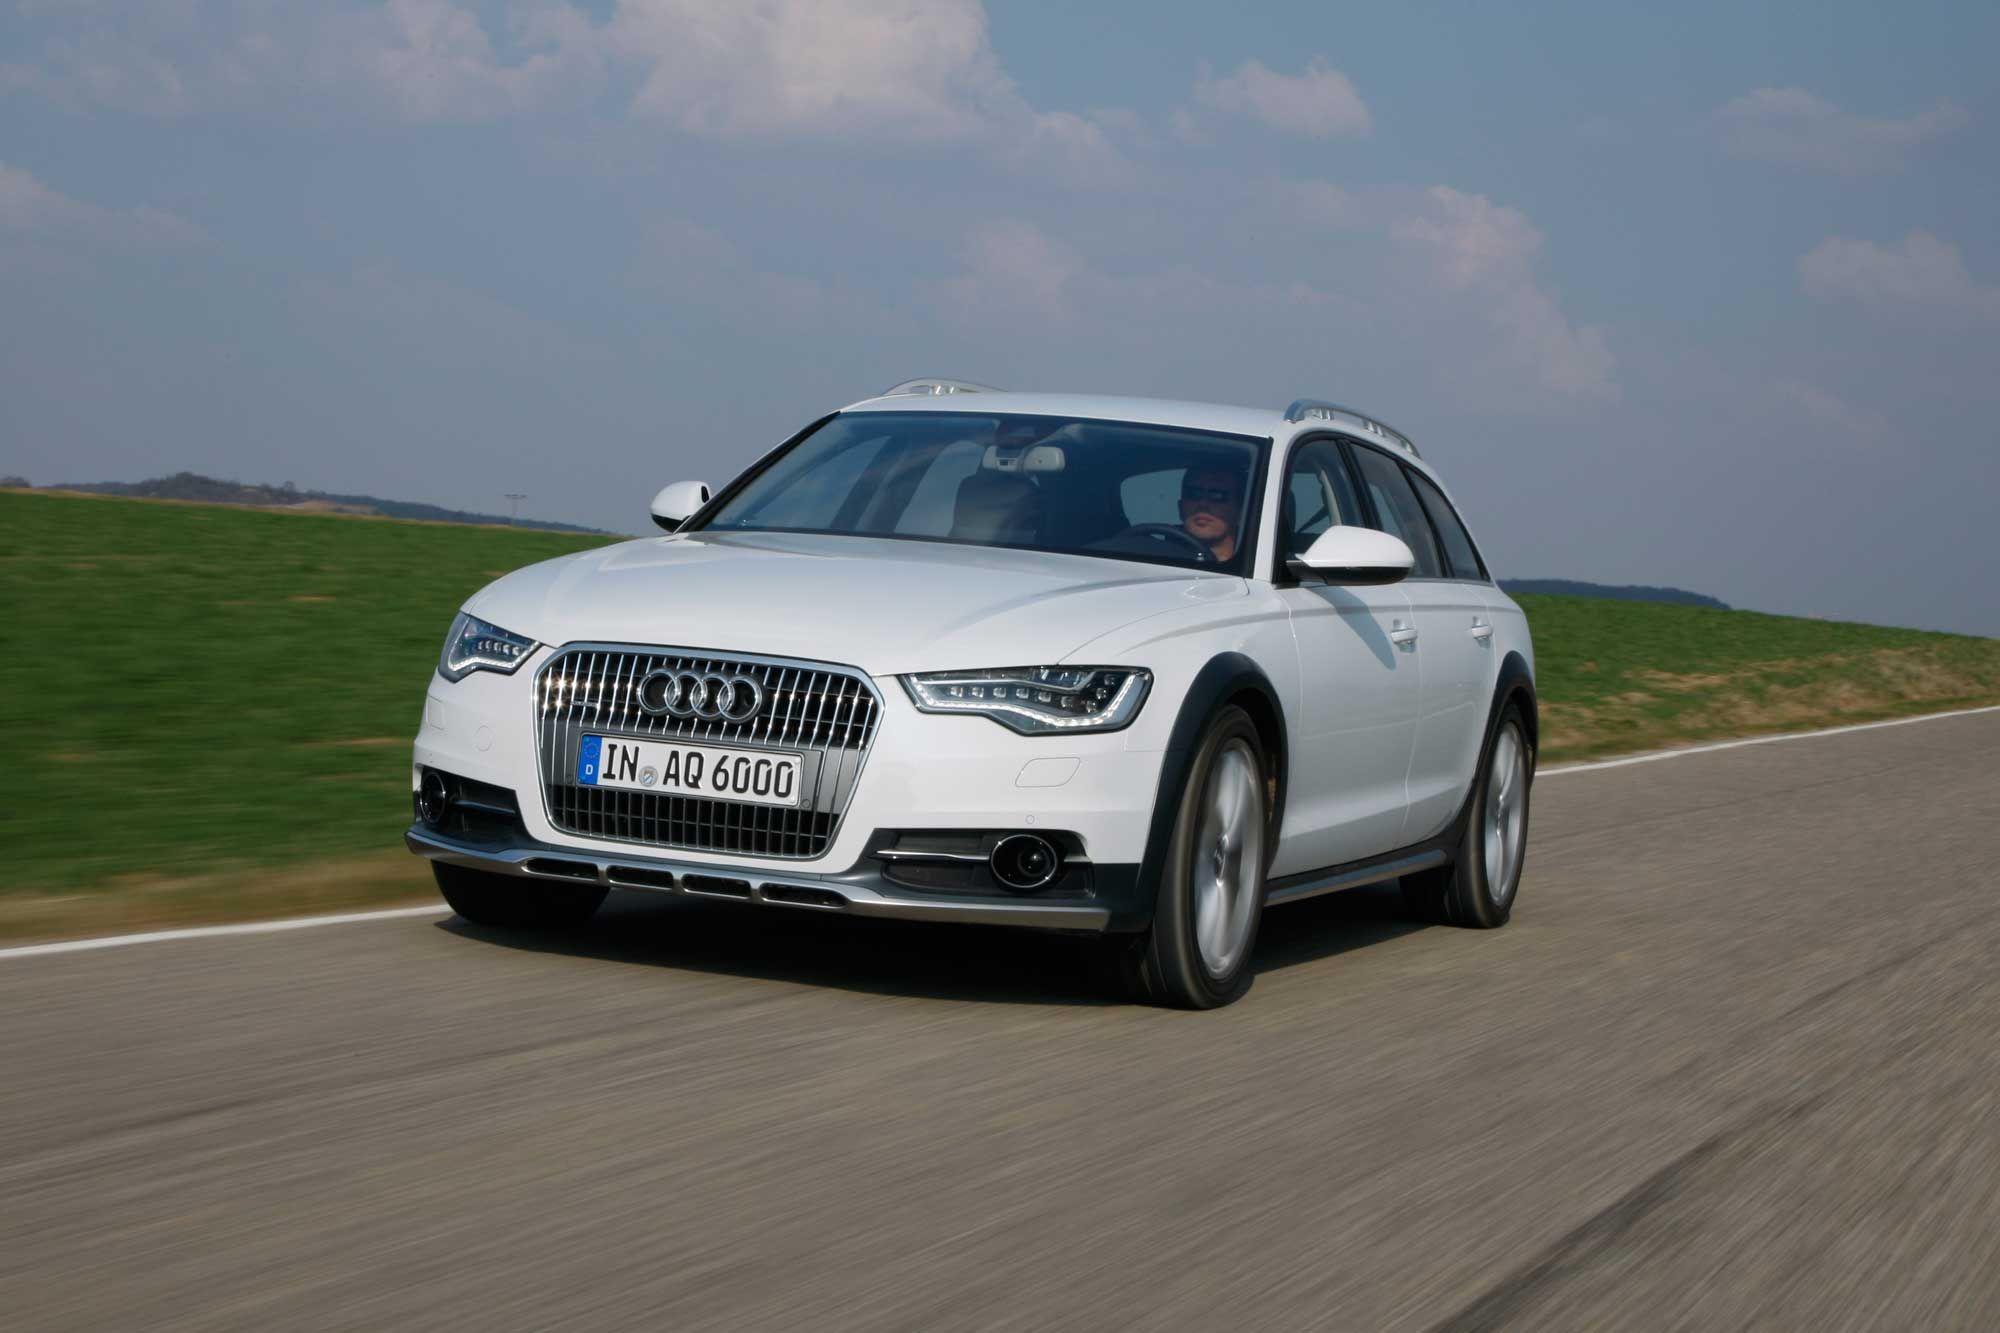 2013 Audi A6 Allroad Estate white car driving